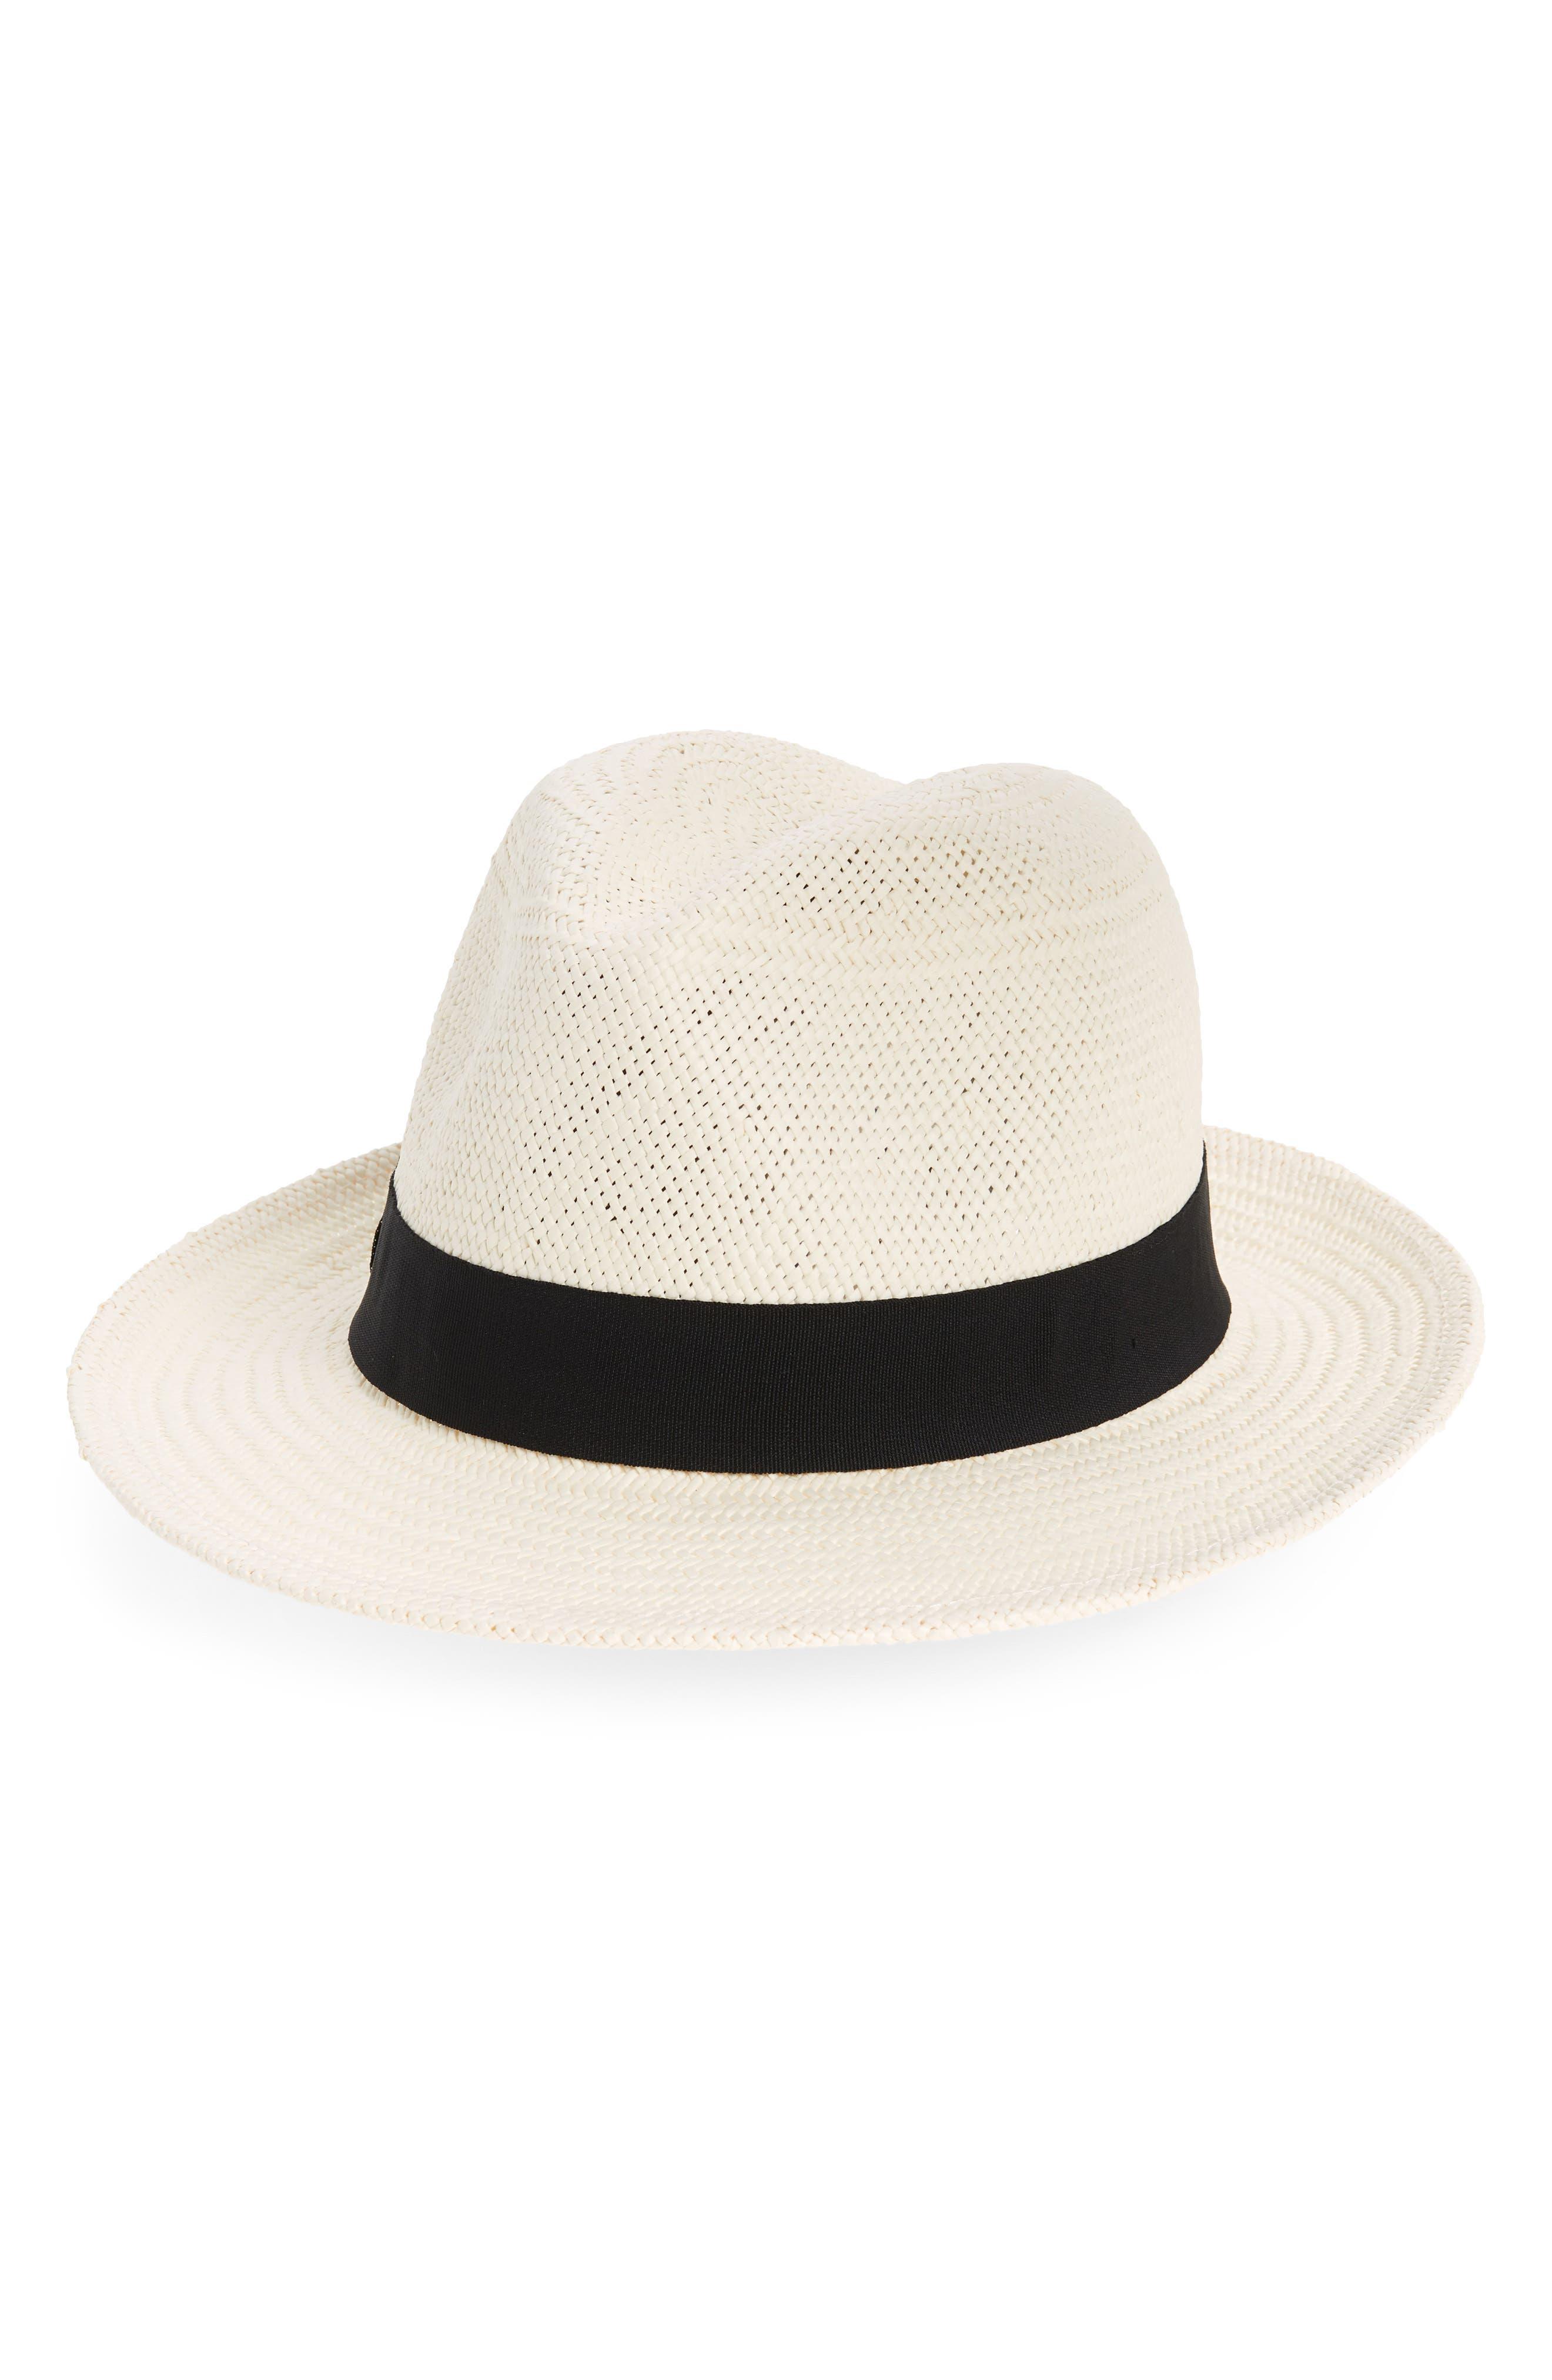 Straw Panama Hat,                         Main,                         color, Ivory